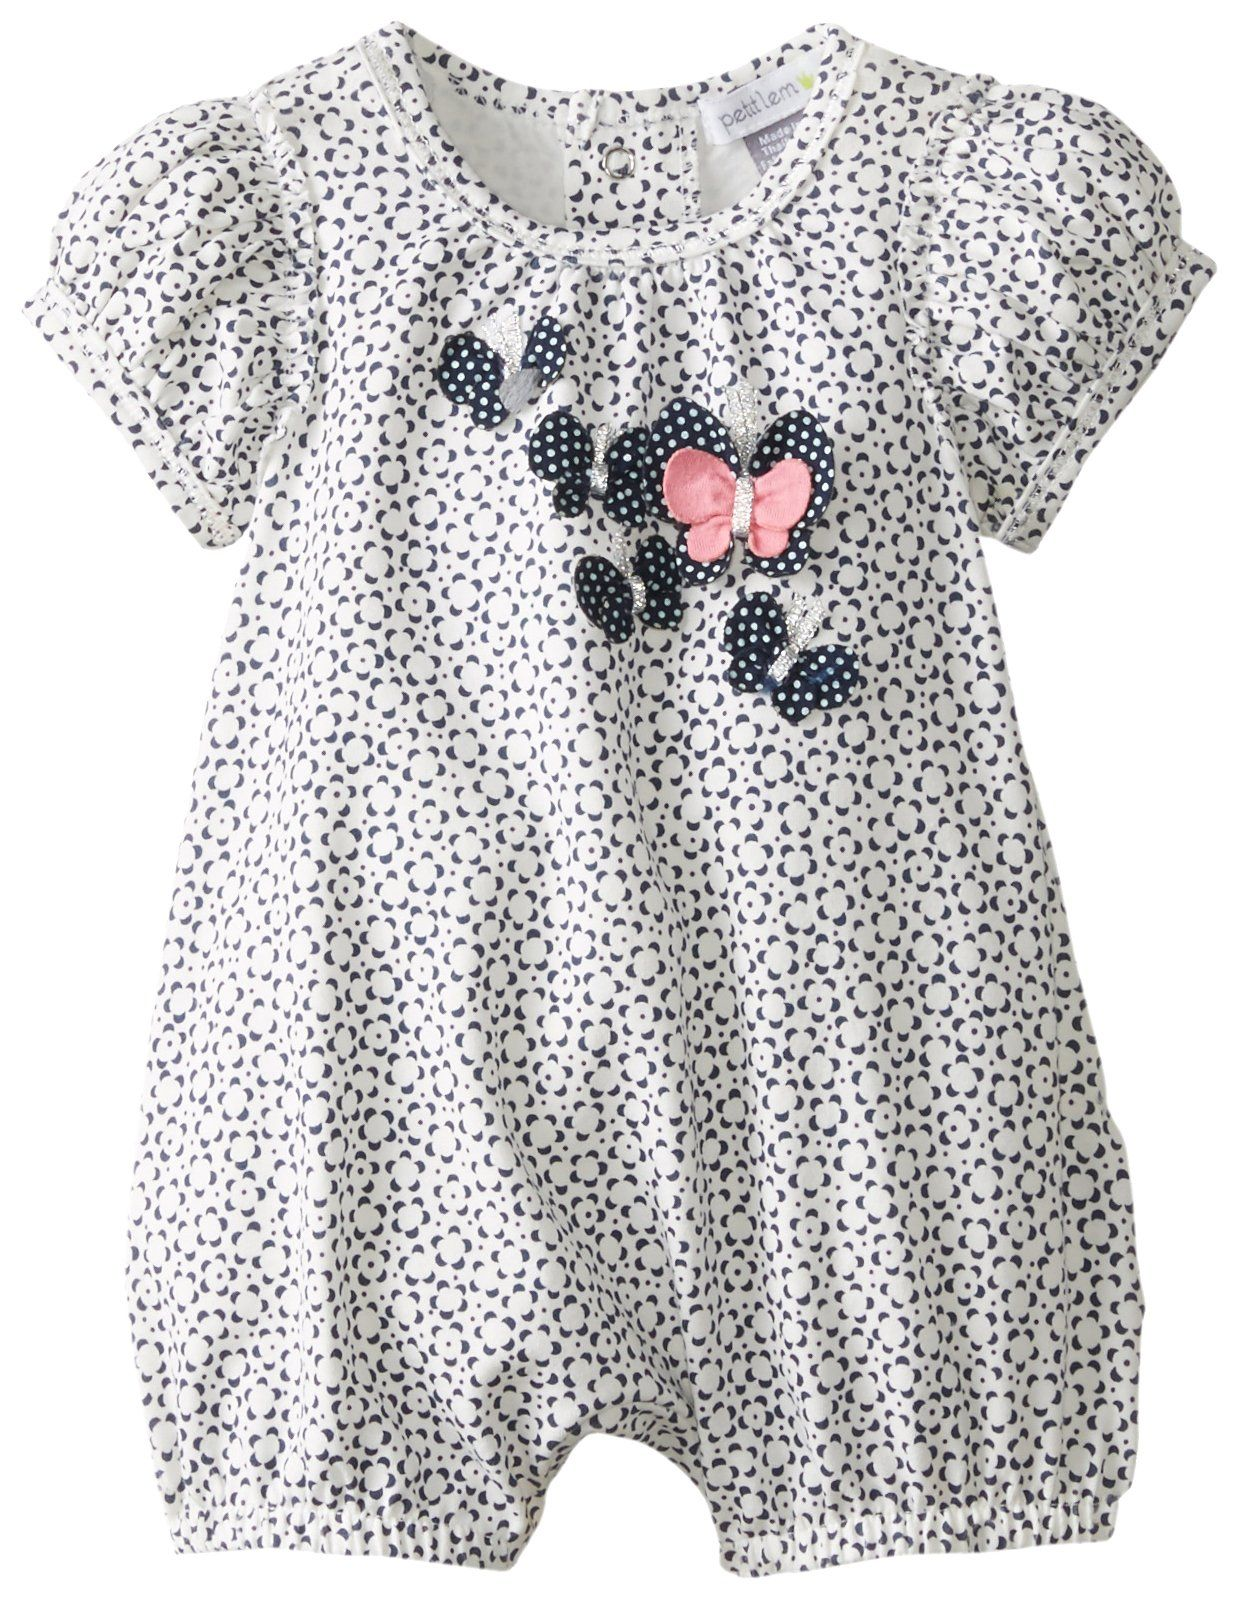 b9d30017c Amazon.com  Petit Lem Baby-Girls Newborn Summer Souvenir Romper ...